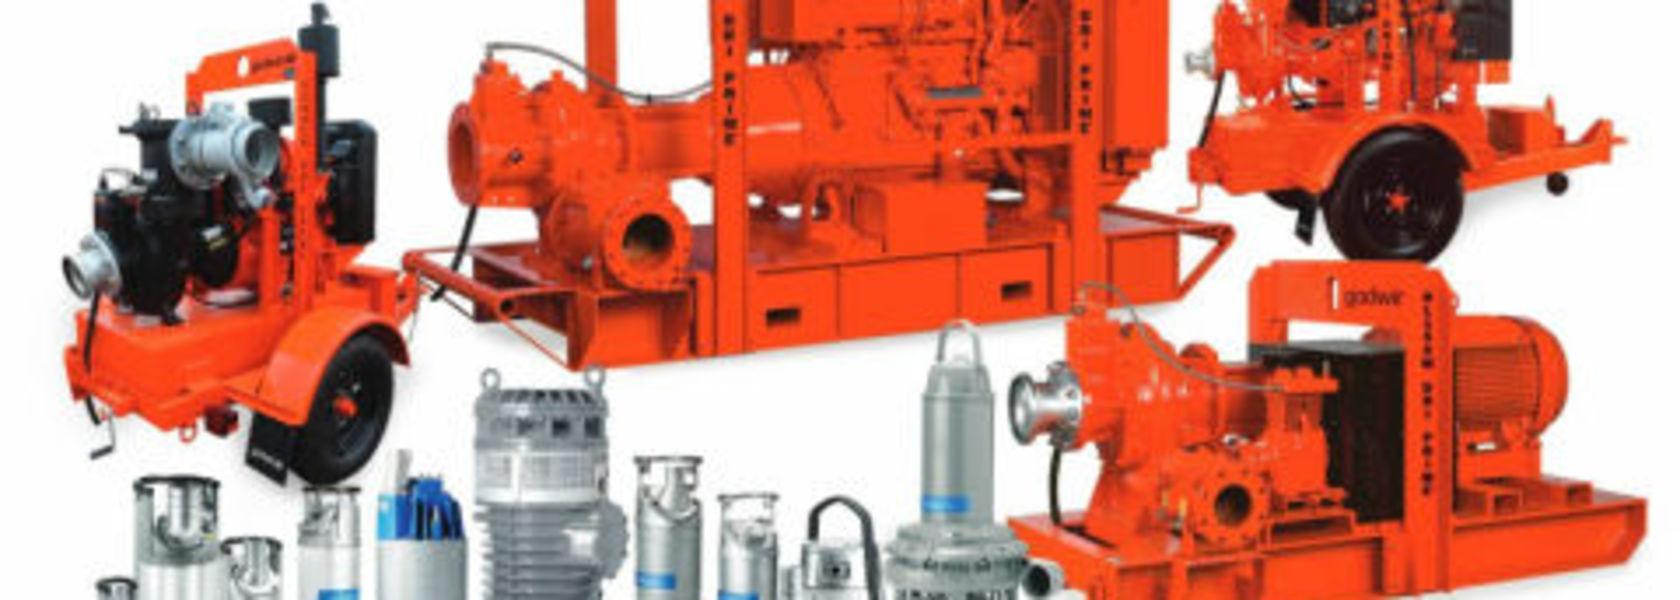 Xylem to expand Godwin pump rental bank - Mining Magazine